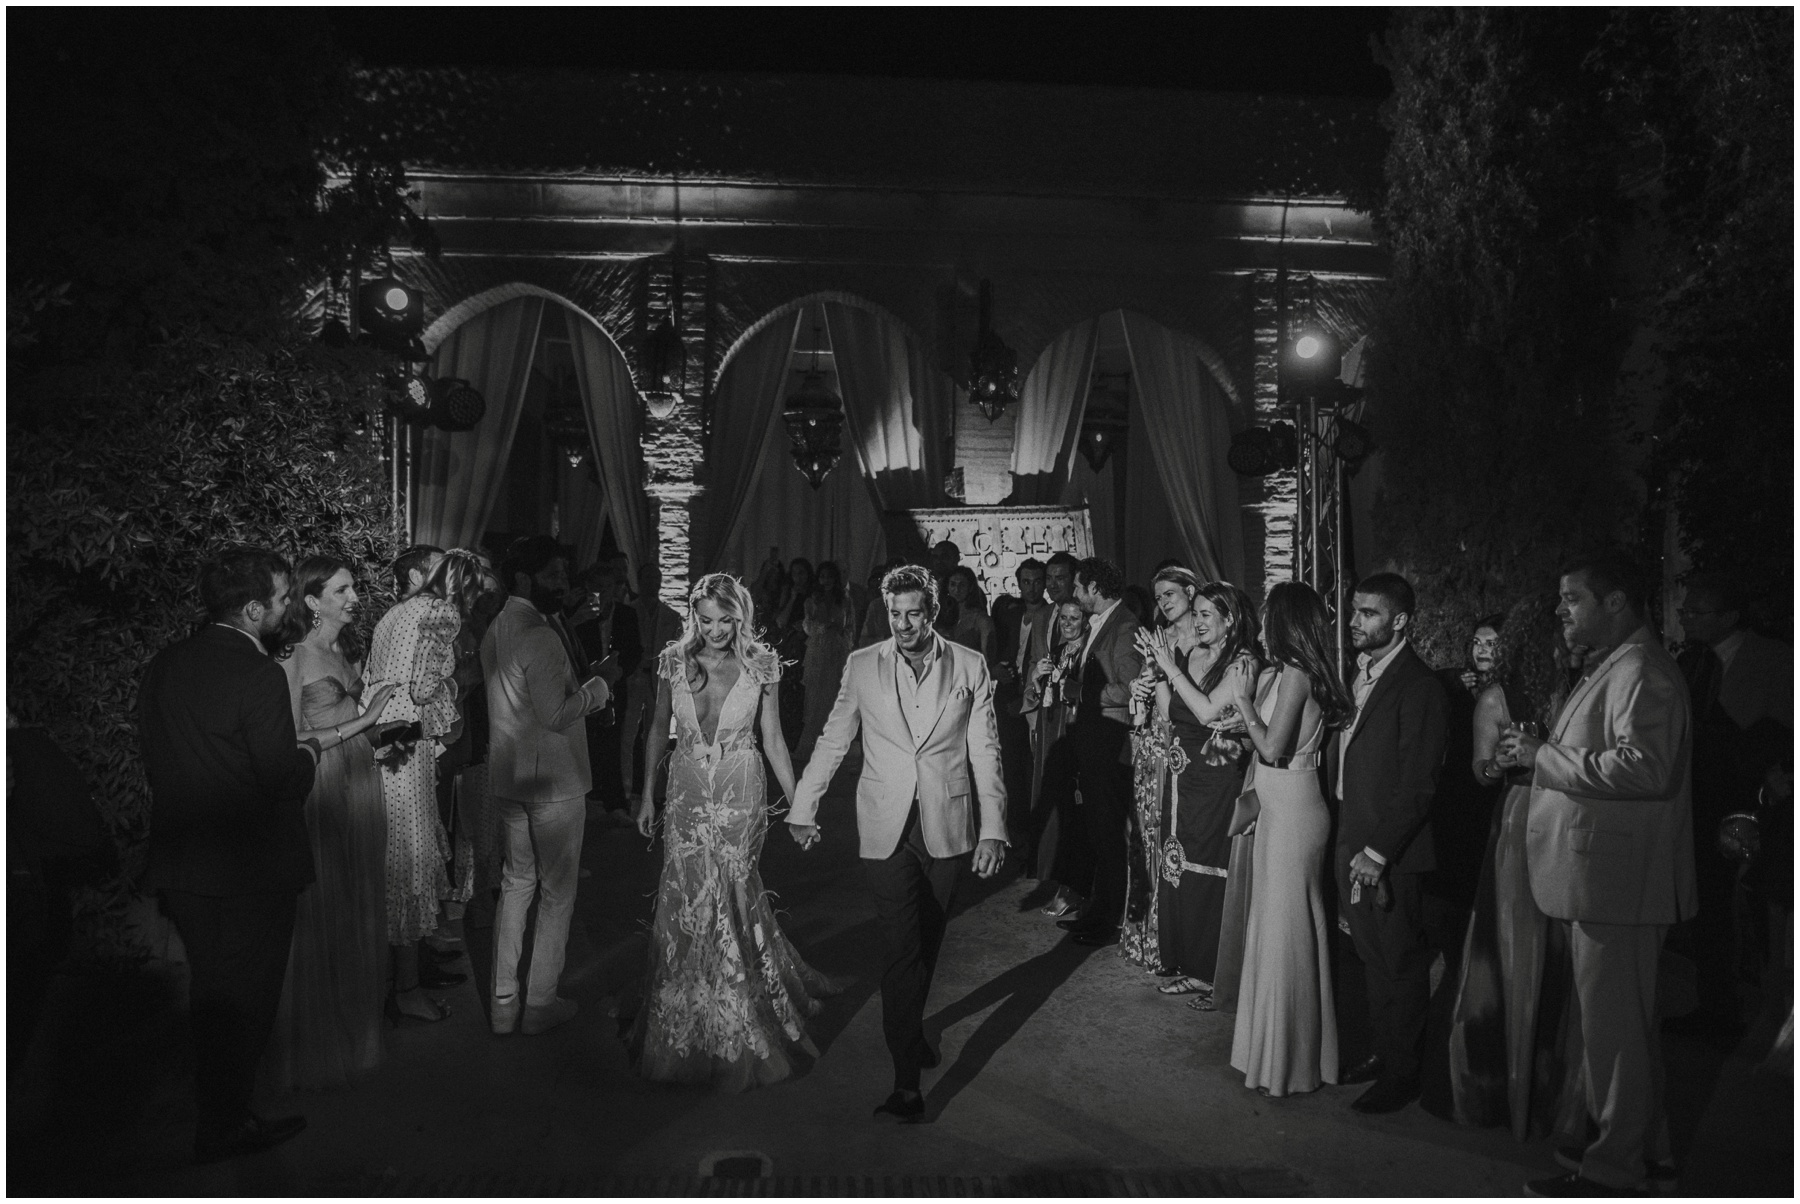 Marrakech Wedding Beldi Coutry Club 073.JPG